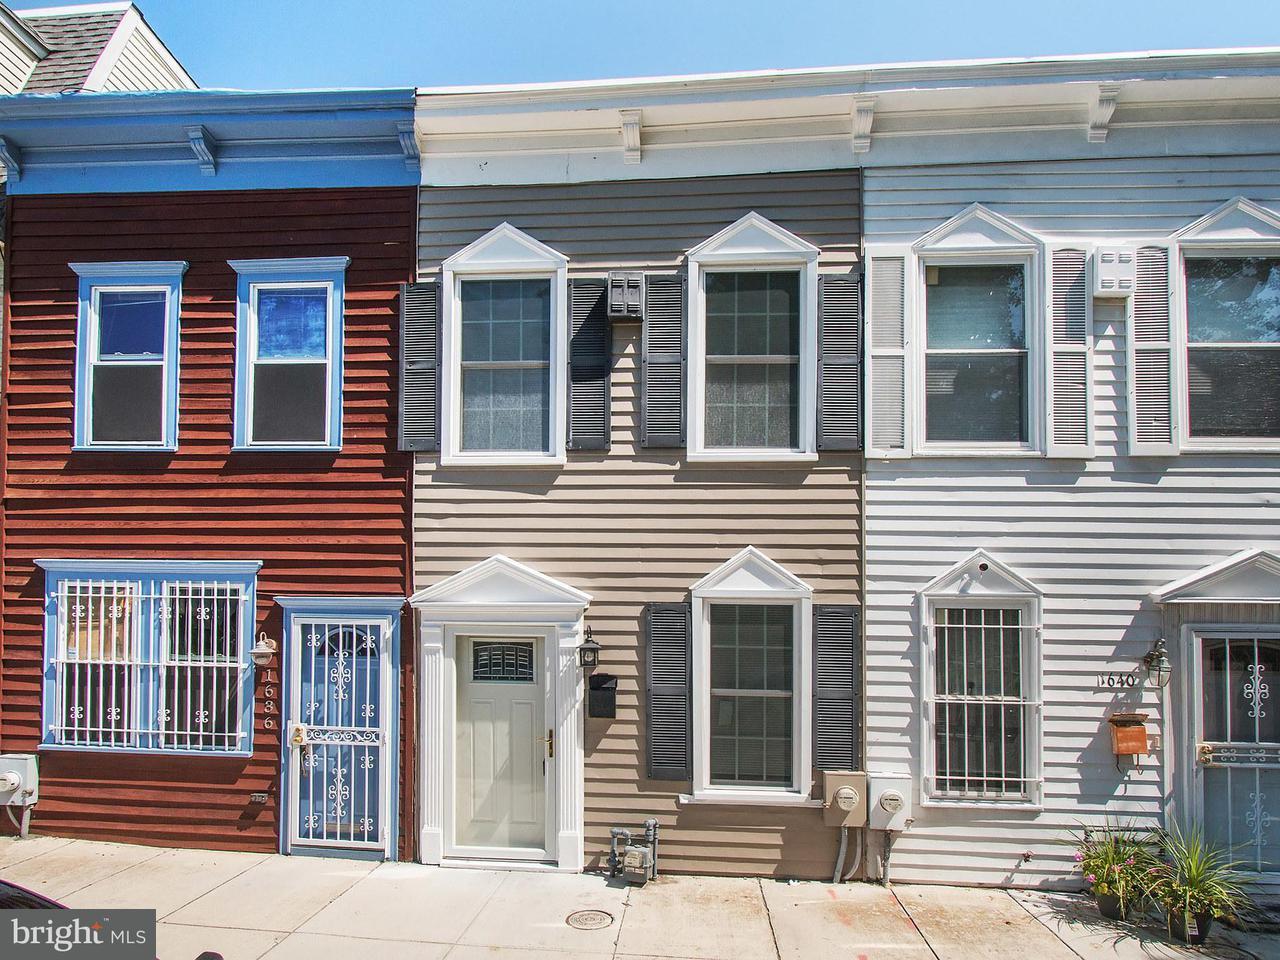 Townhouse for Sale at 1638 Kramer St Ne 1638 Kramer St Ne Washington, District Of Columbia 20002 United States